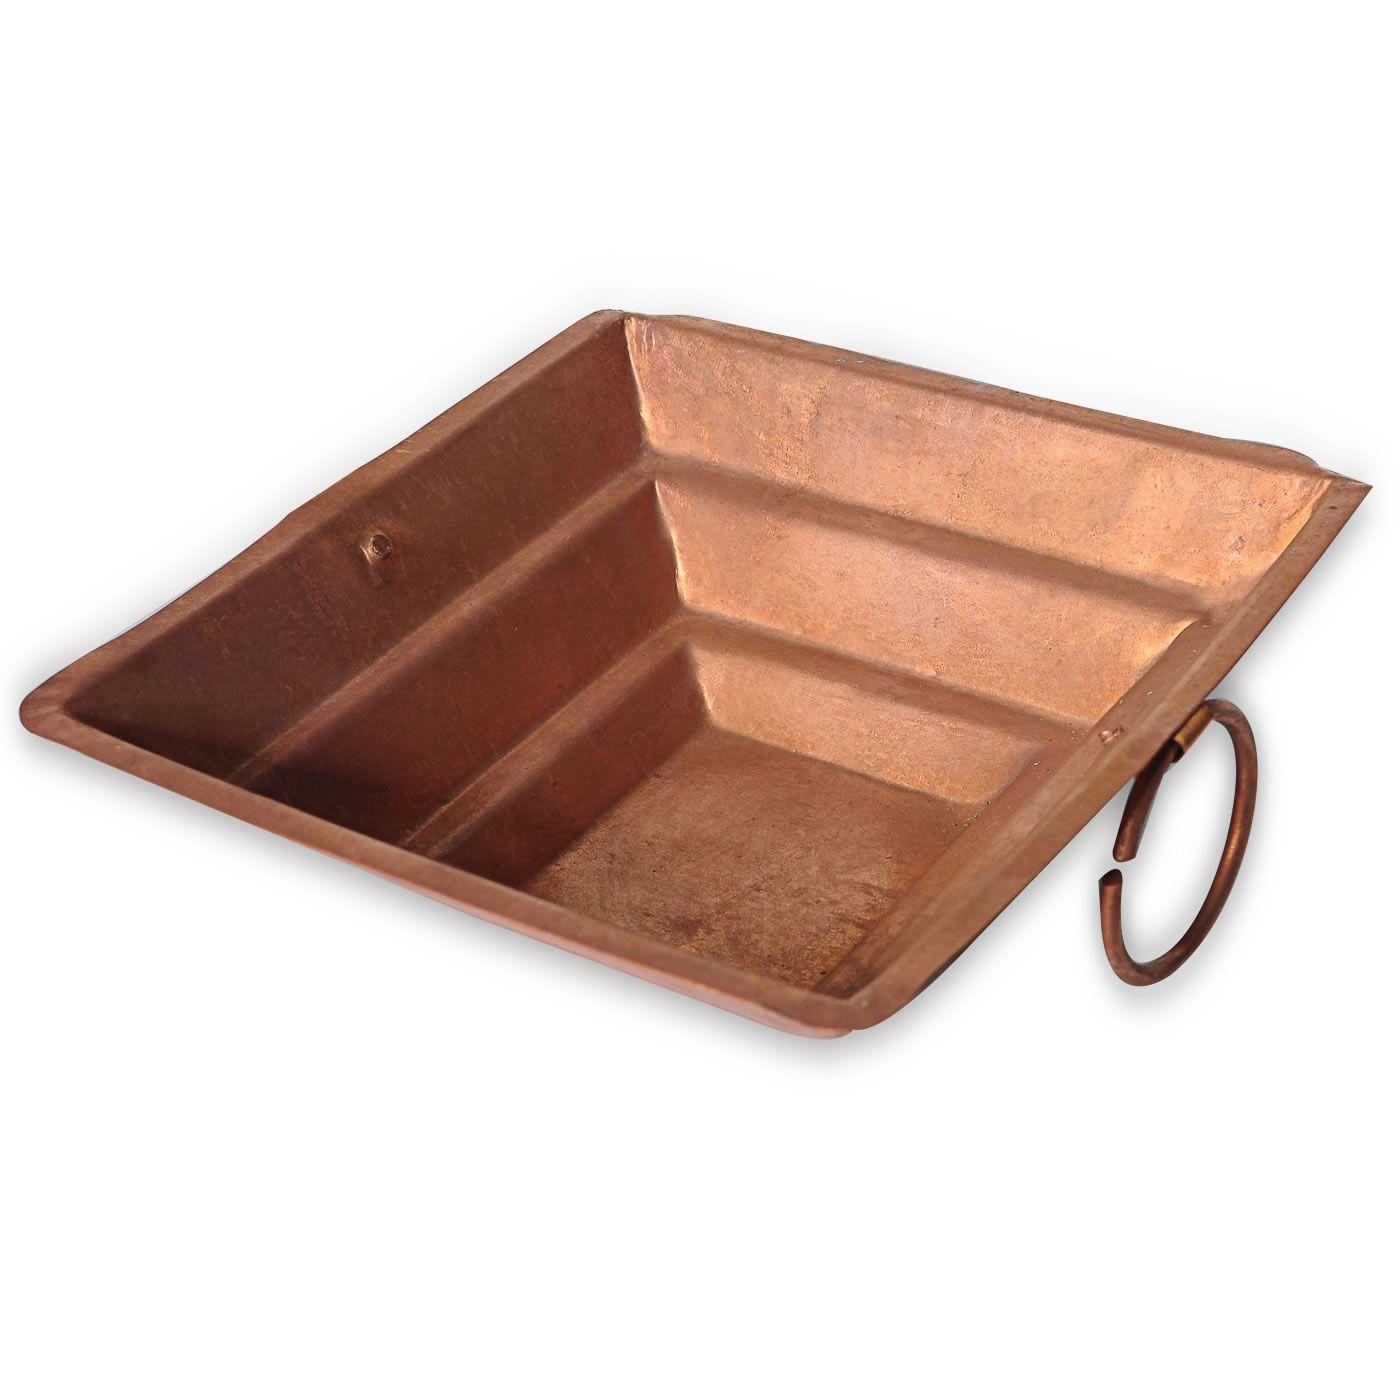 copper kitchen utensil holder upgrade ideas handmade utensils view more amazing